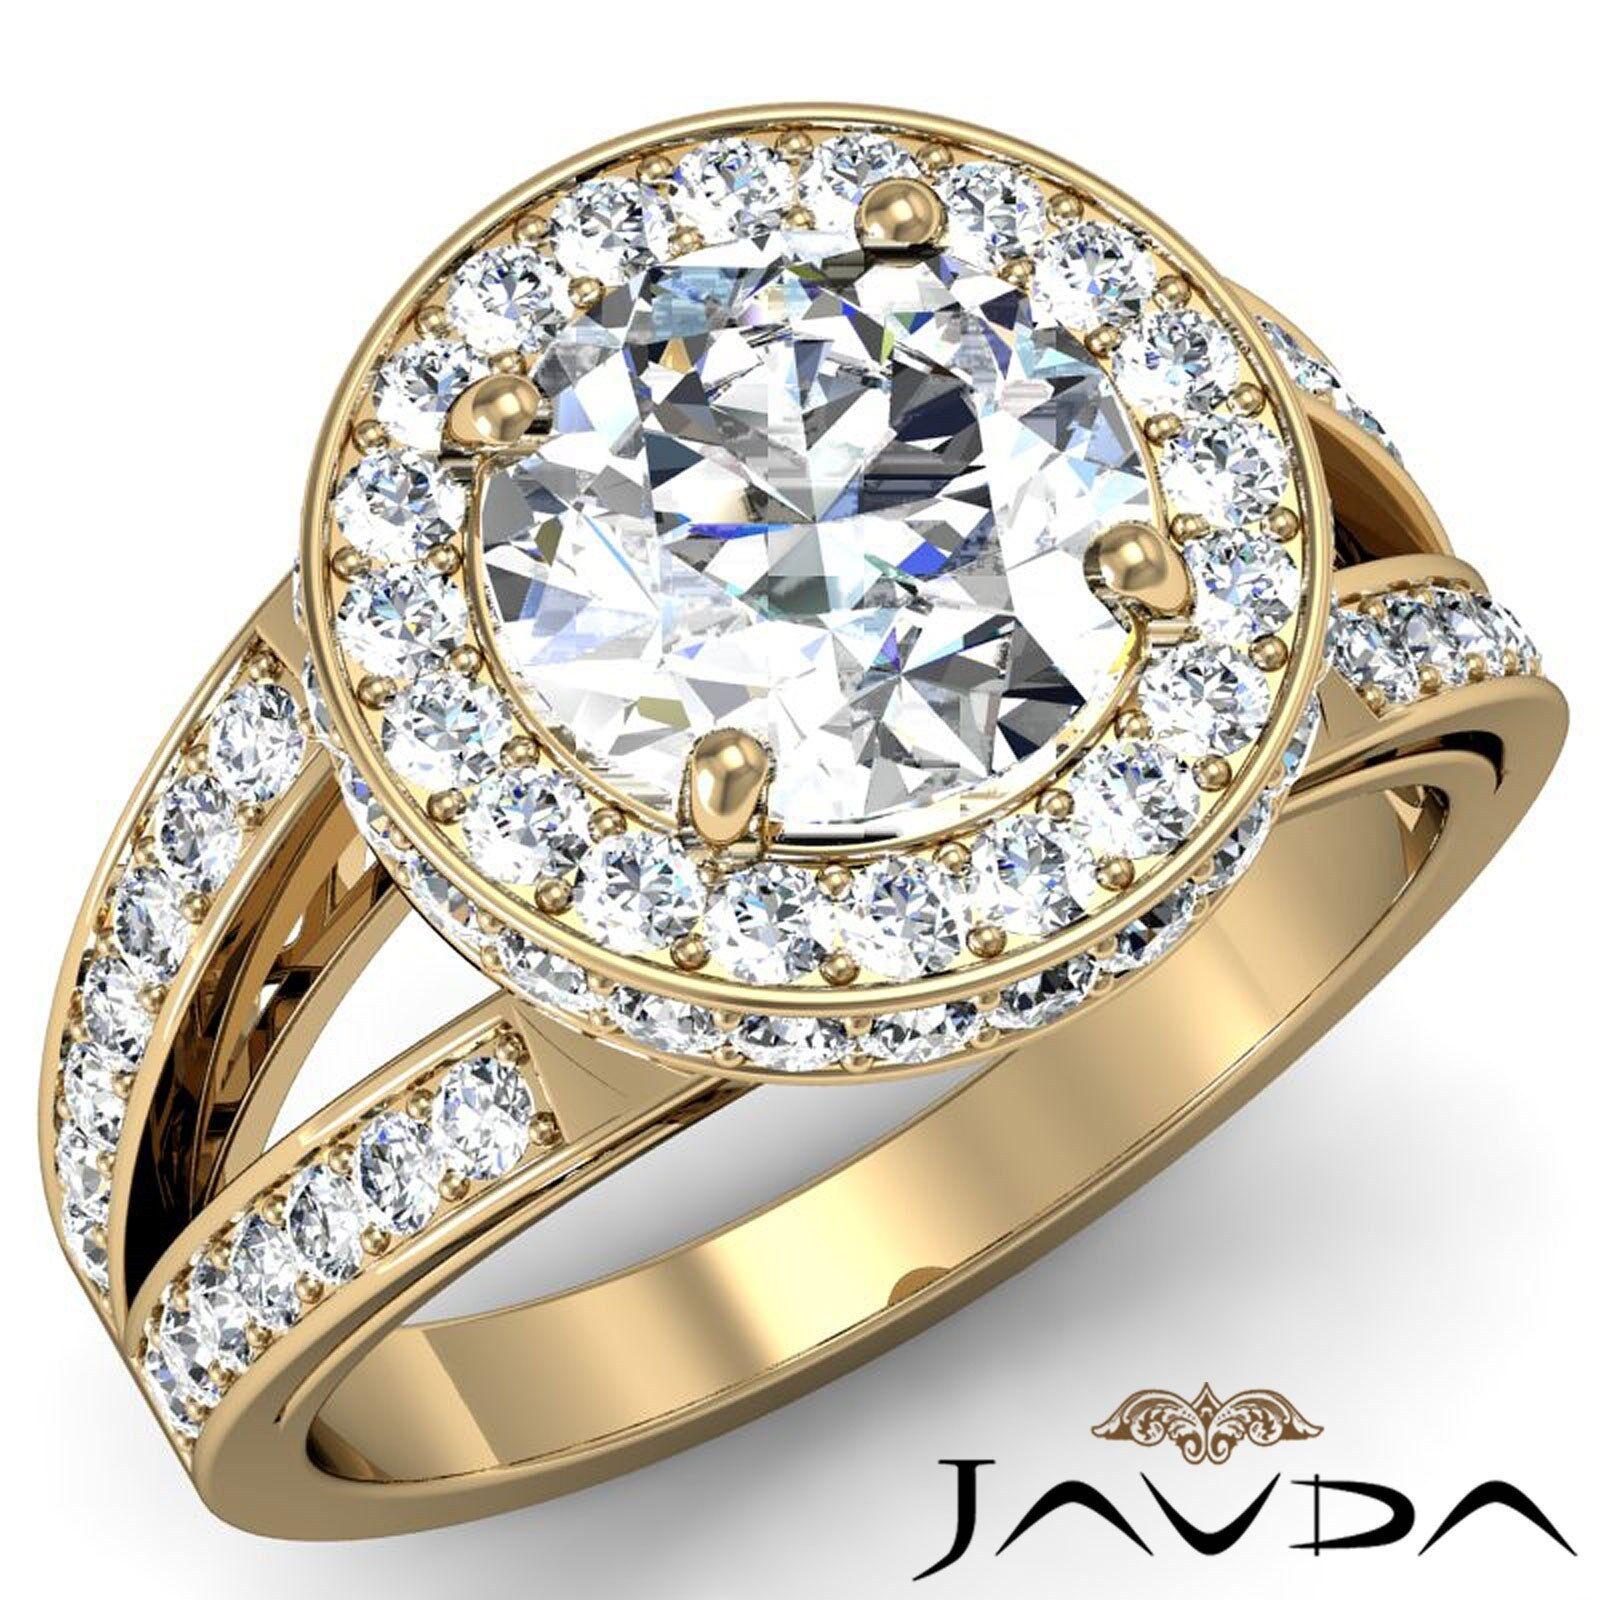 Circa Halo Split Shank Round Diamond Engagement Filigree Ring GIA G VS2 2.26 Ct